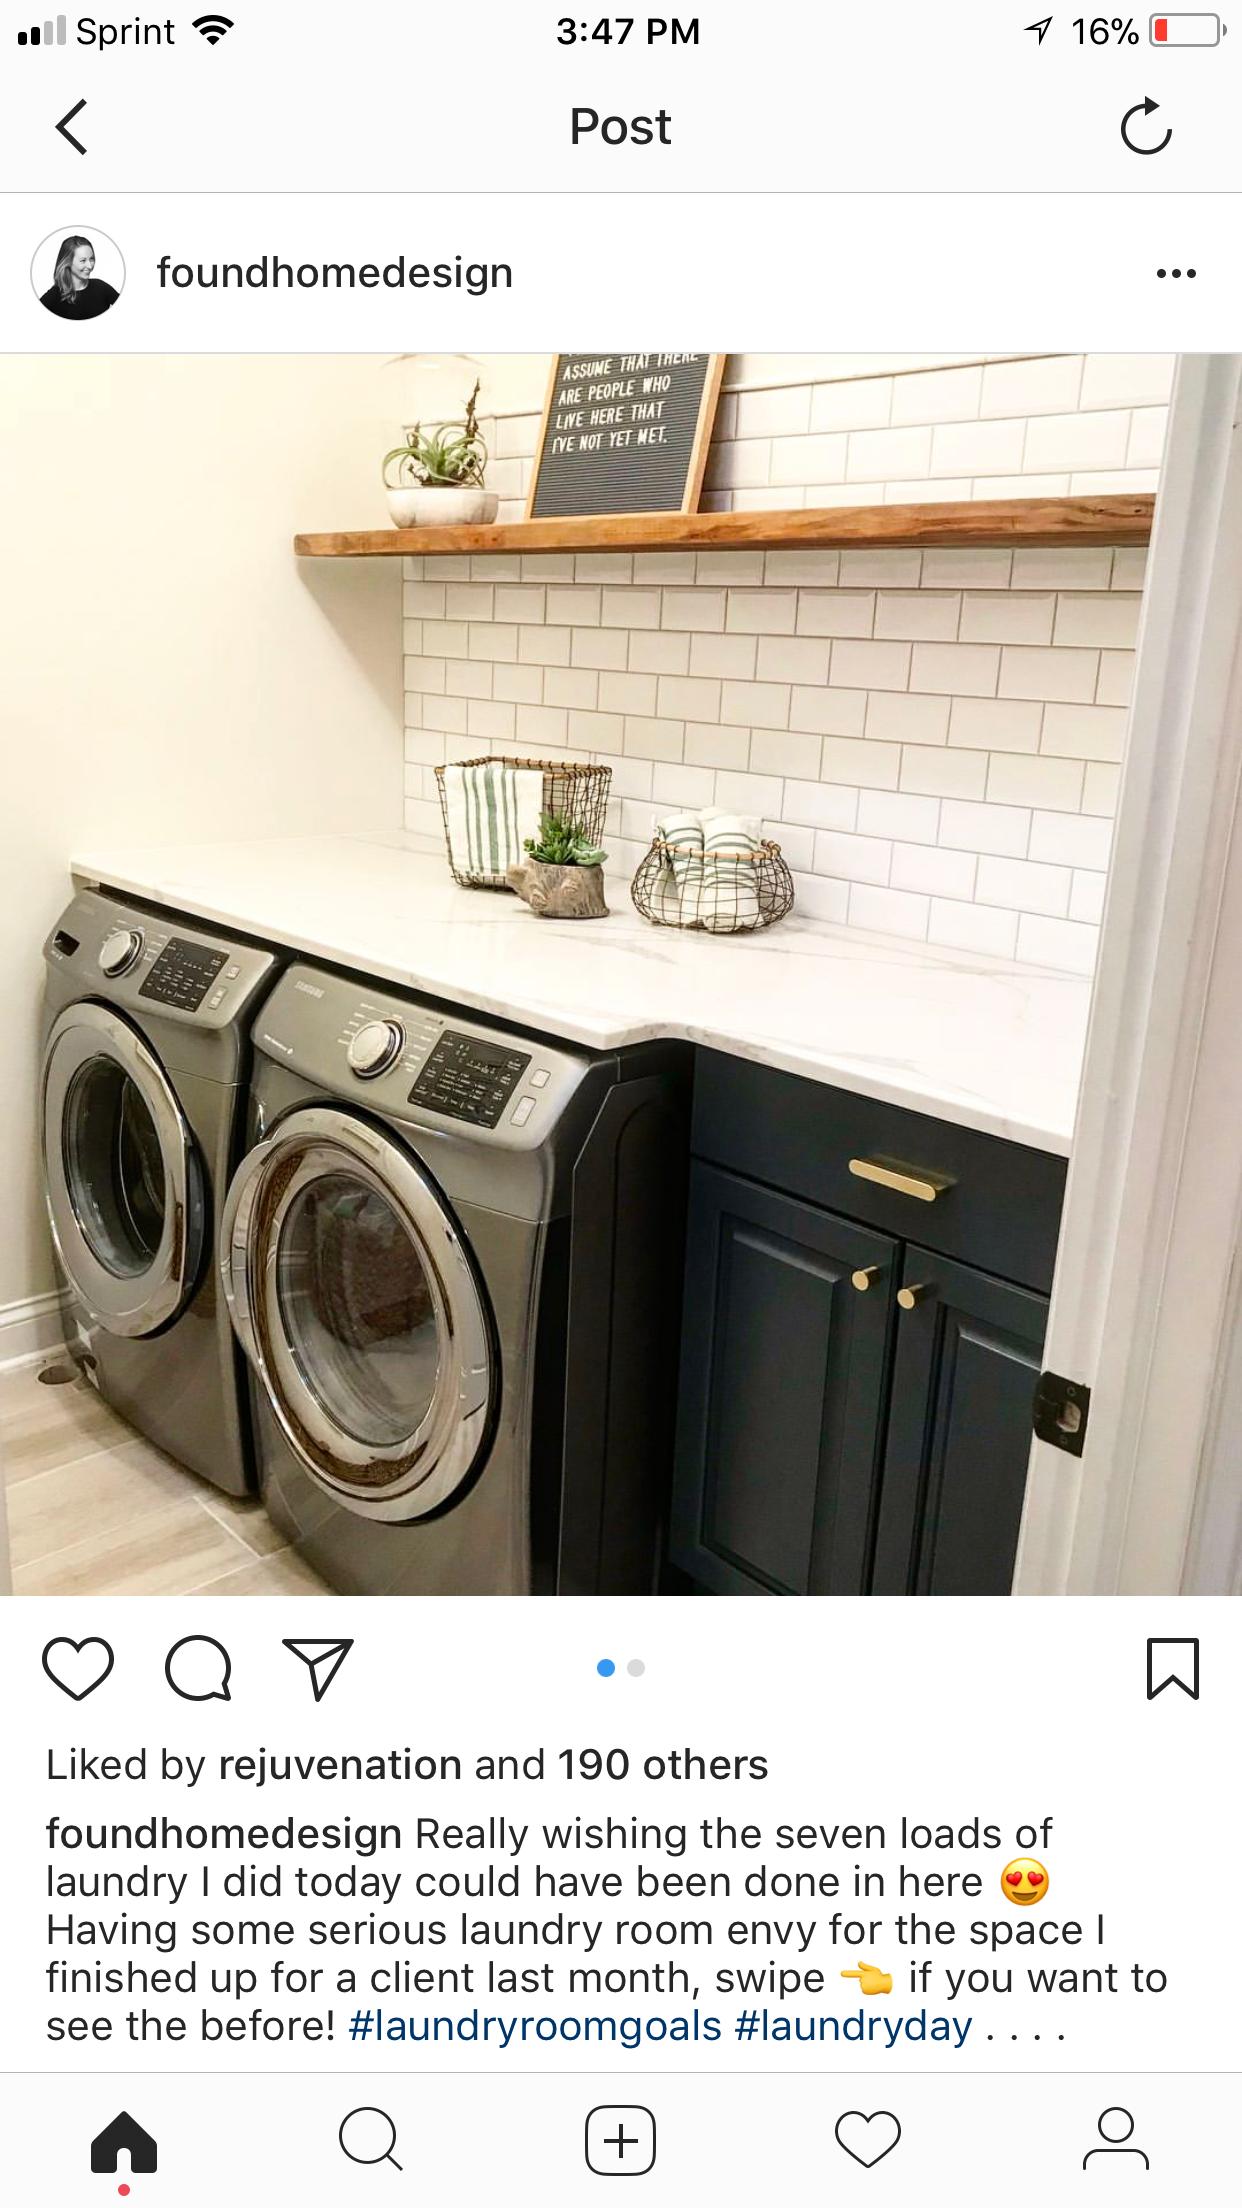 10x10 Laundry Room Layout: Pin By Heather Barta On Laundry